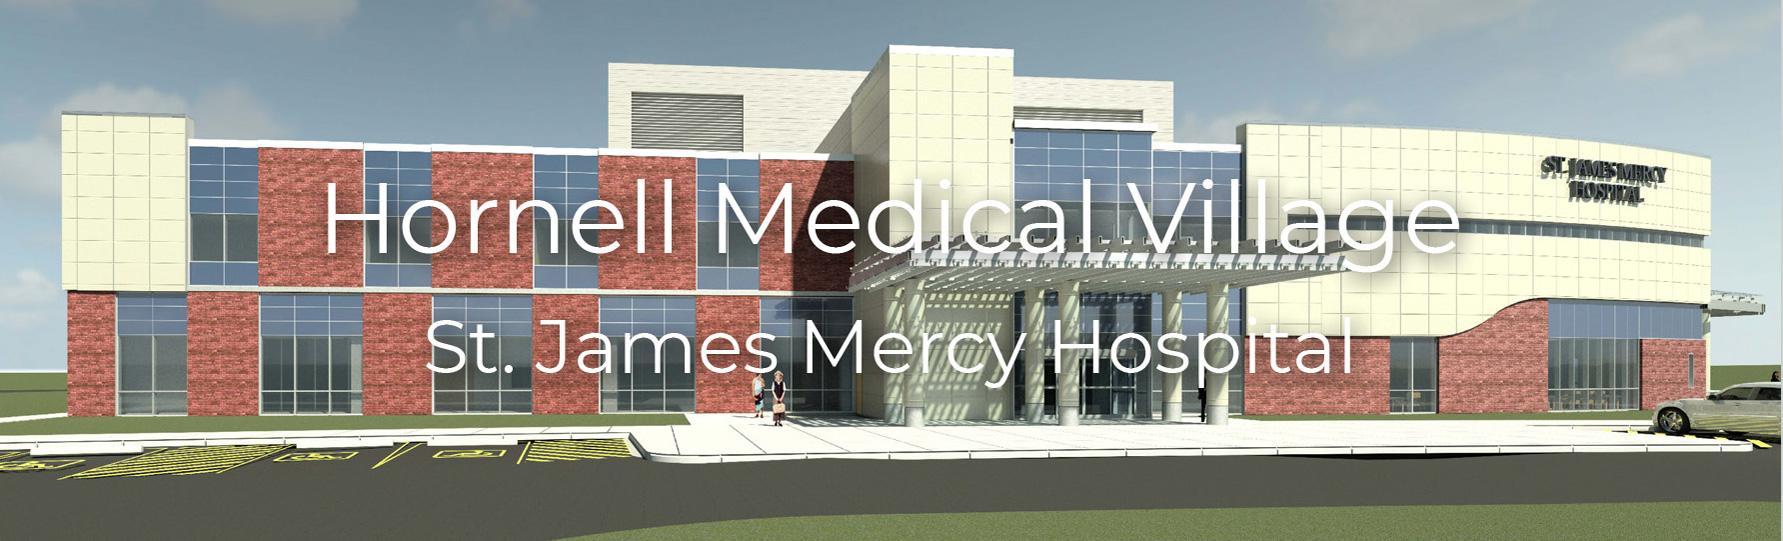 St. James Mercy Hospital